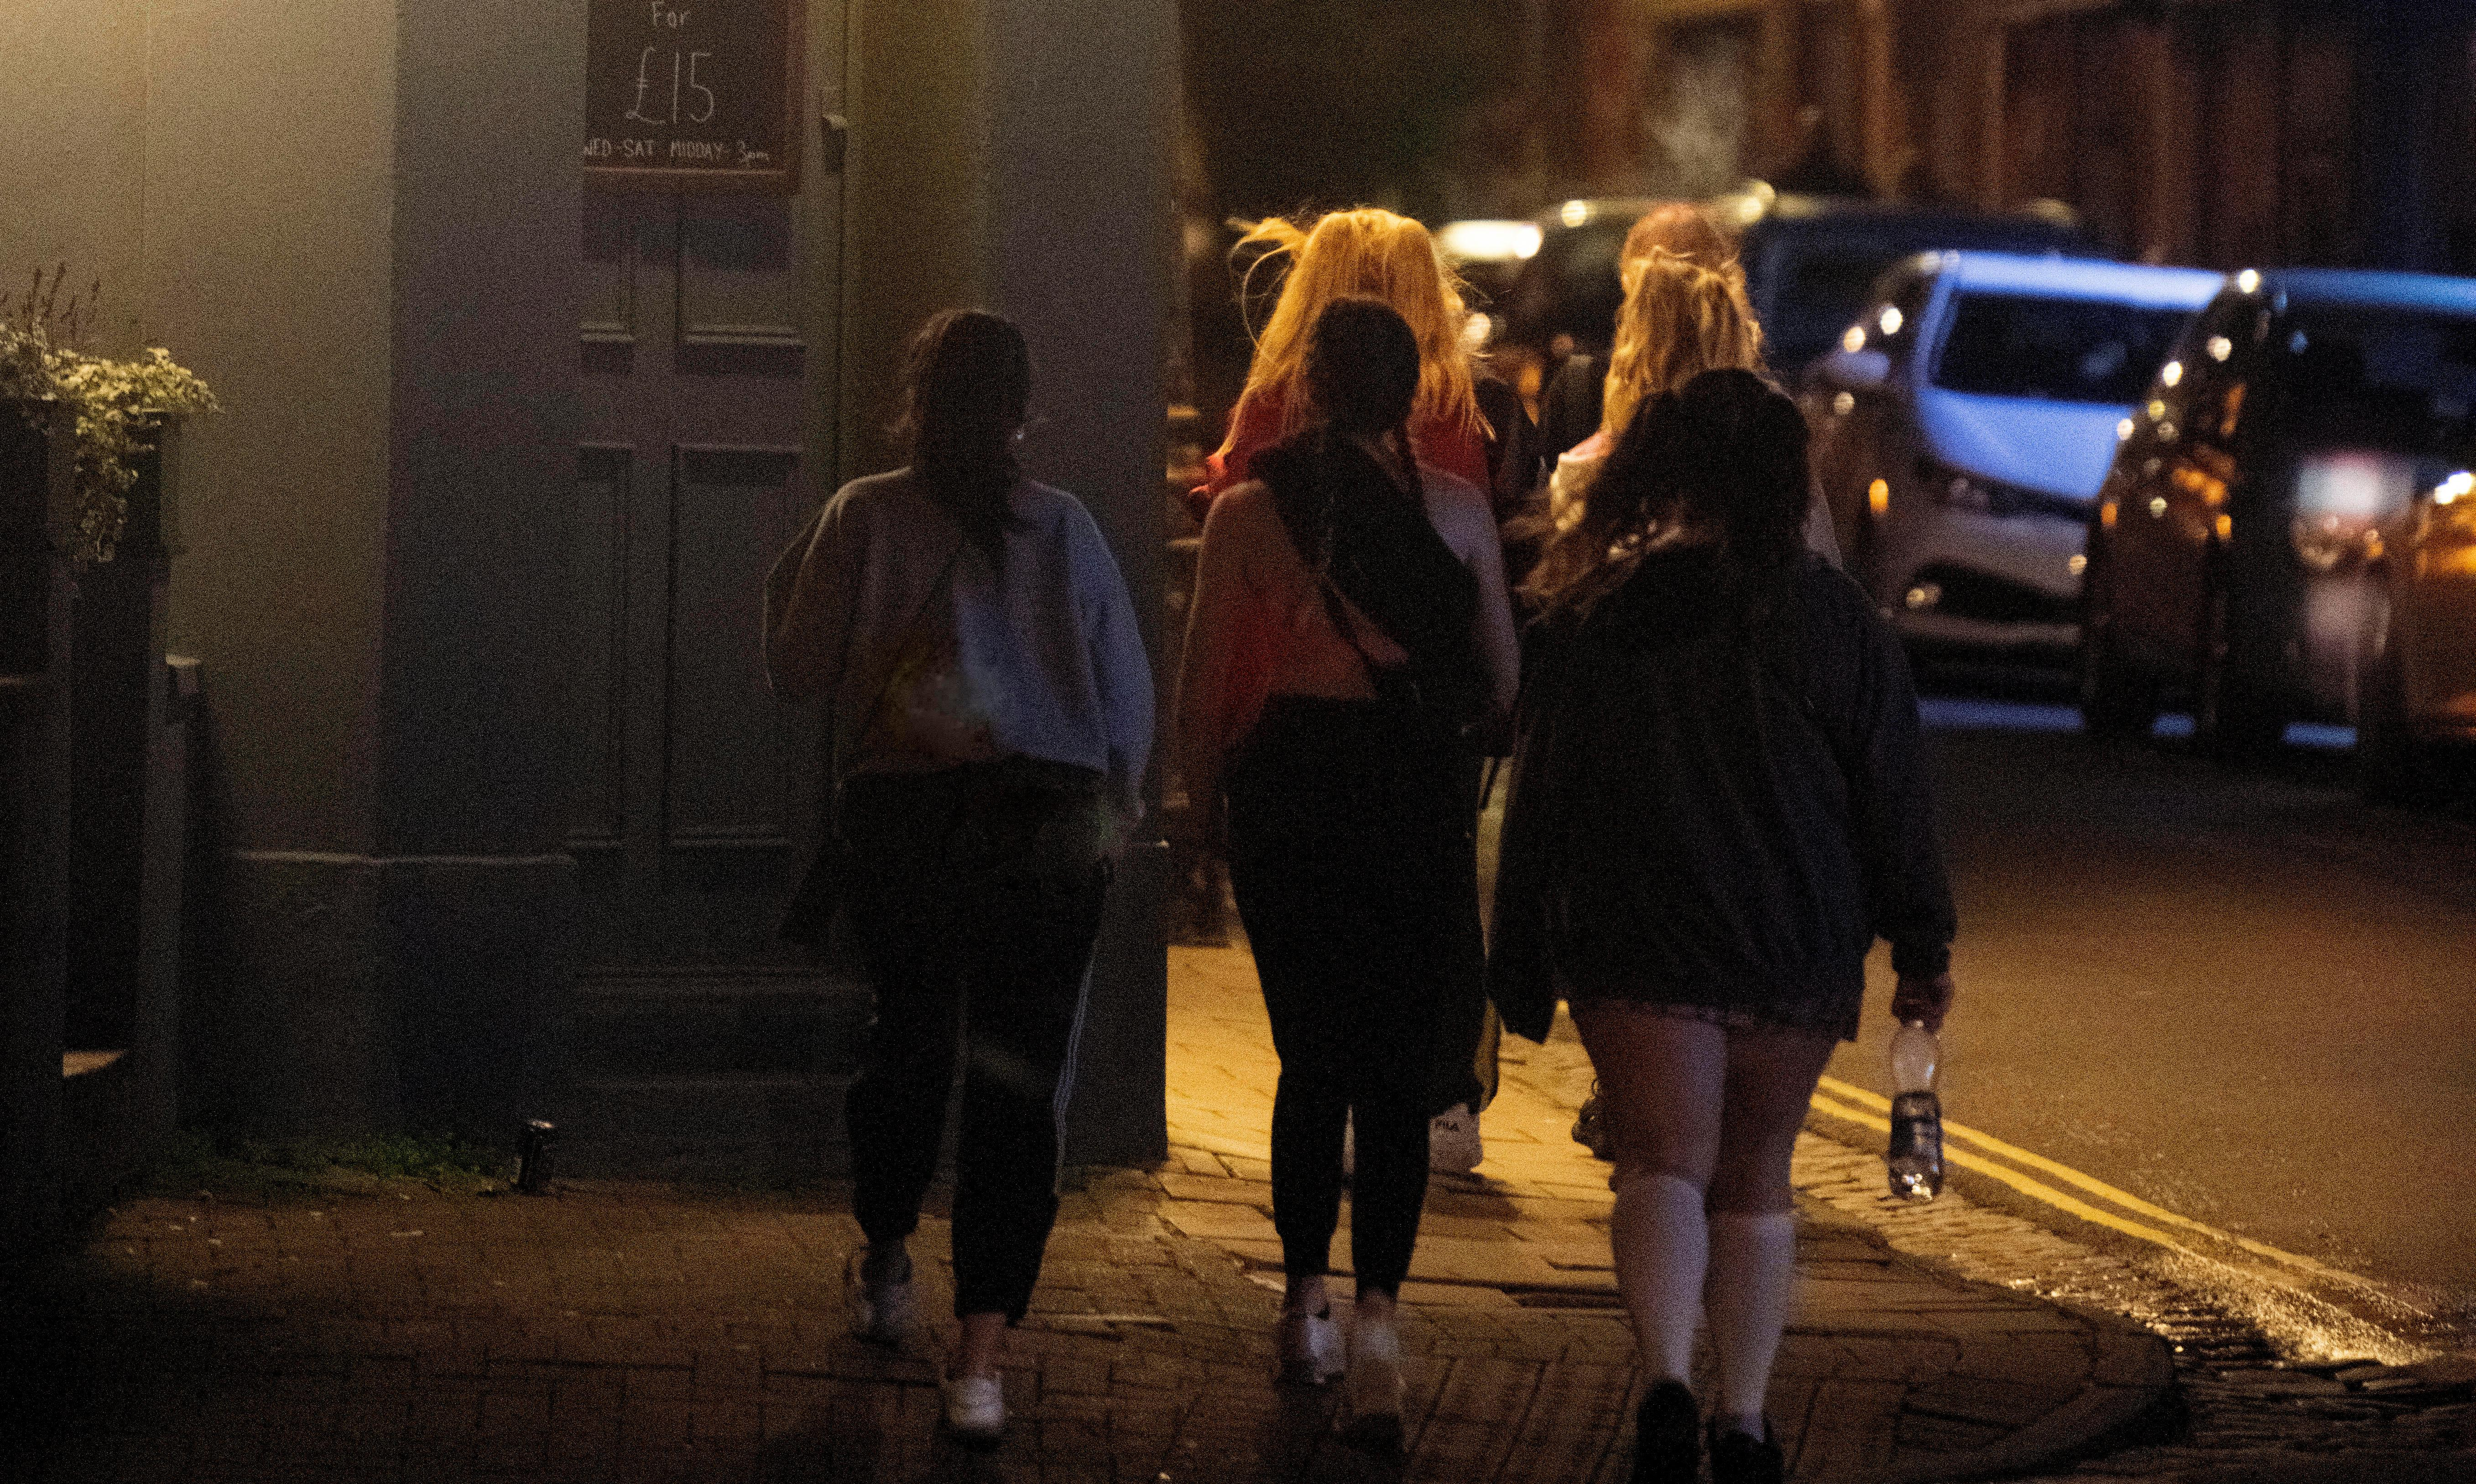 Bristol University pays for late-night police patrols targeting noisy students